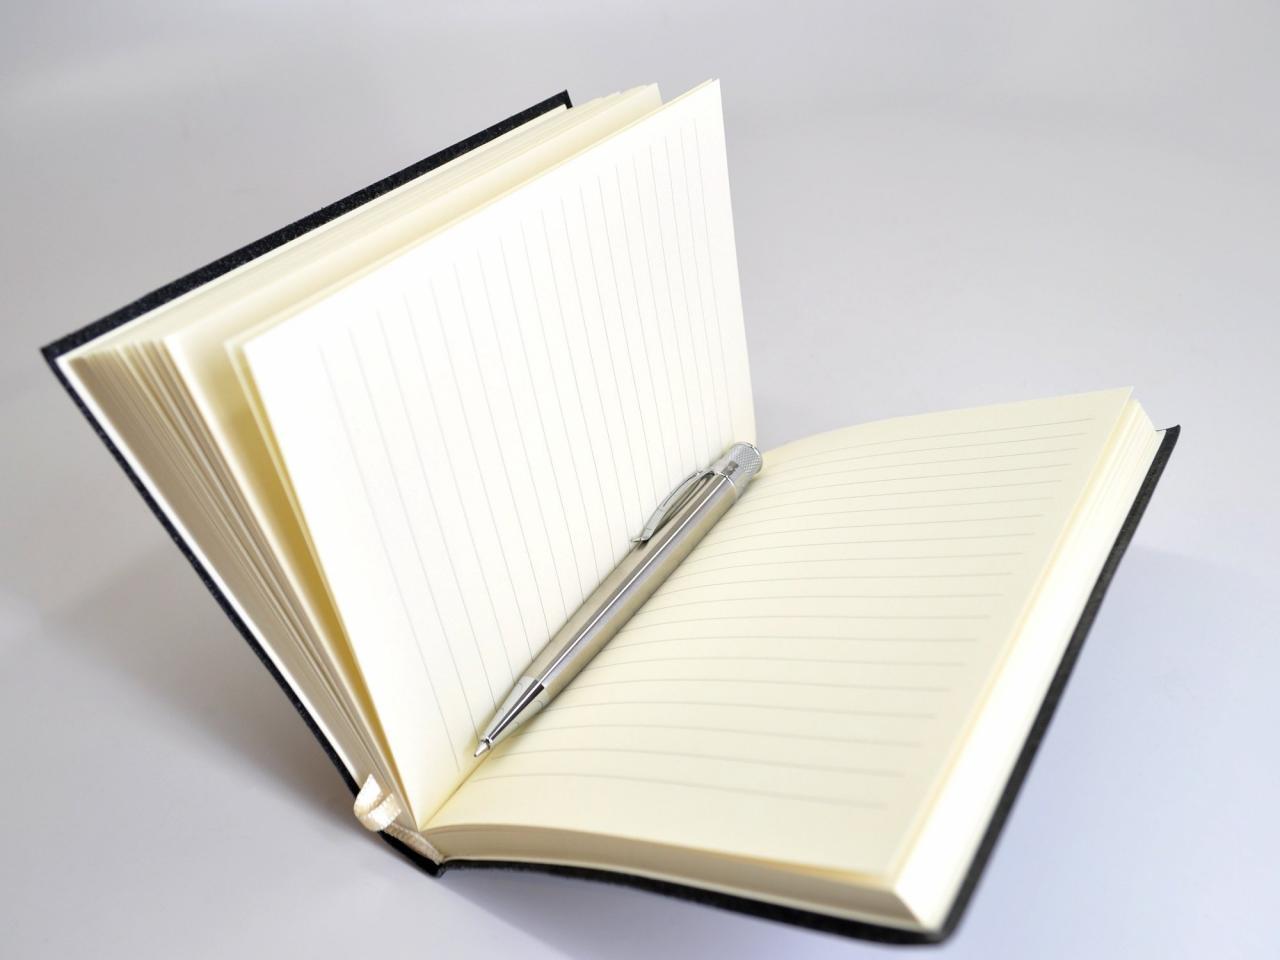 Black Leather Executive Journal – Jenni Bick Bookbinding